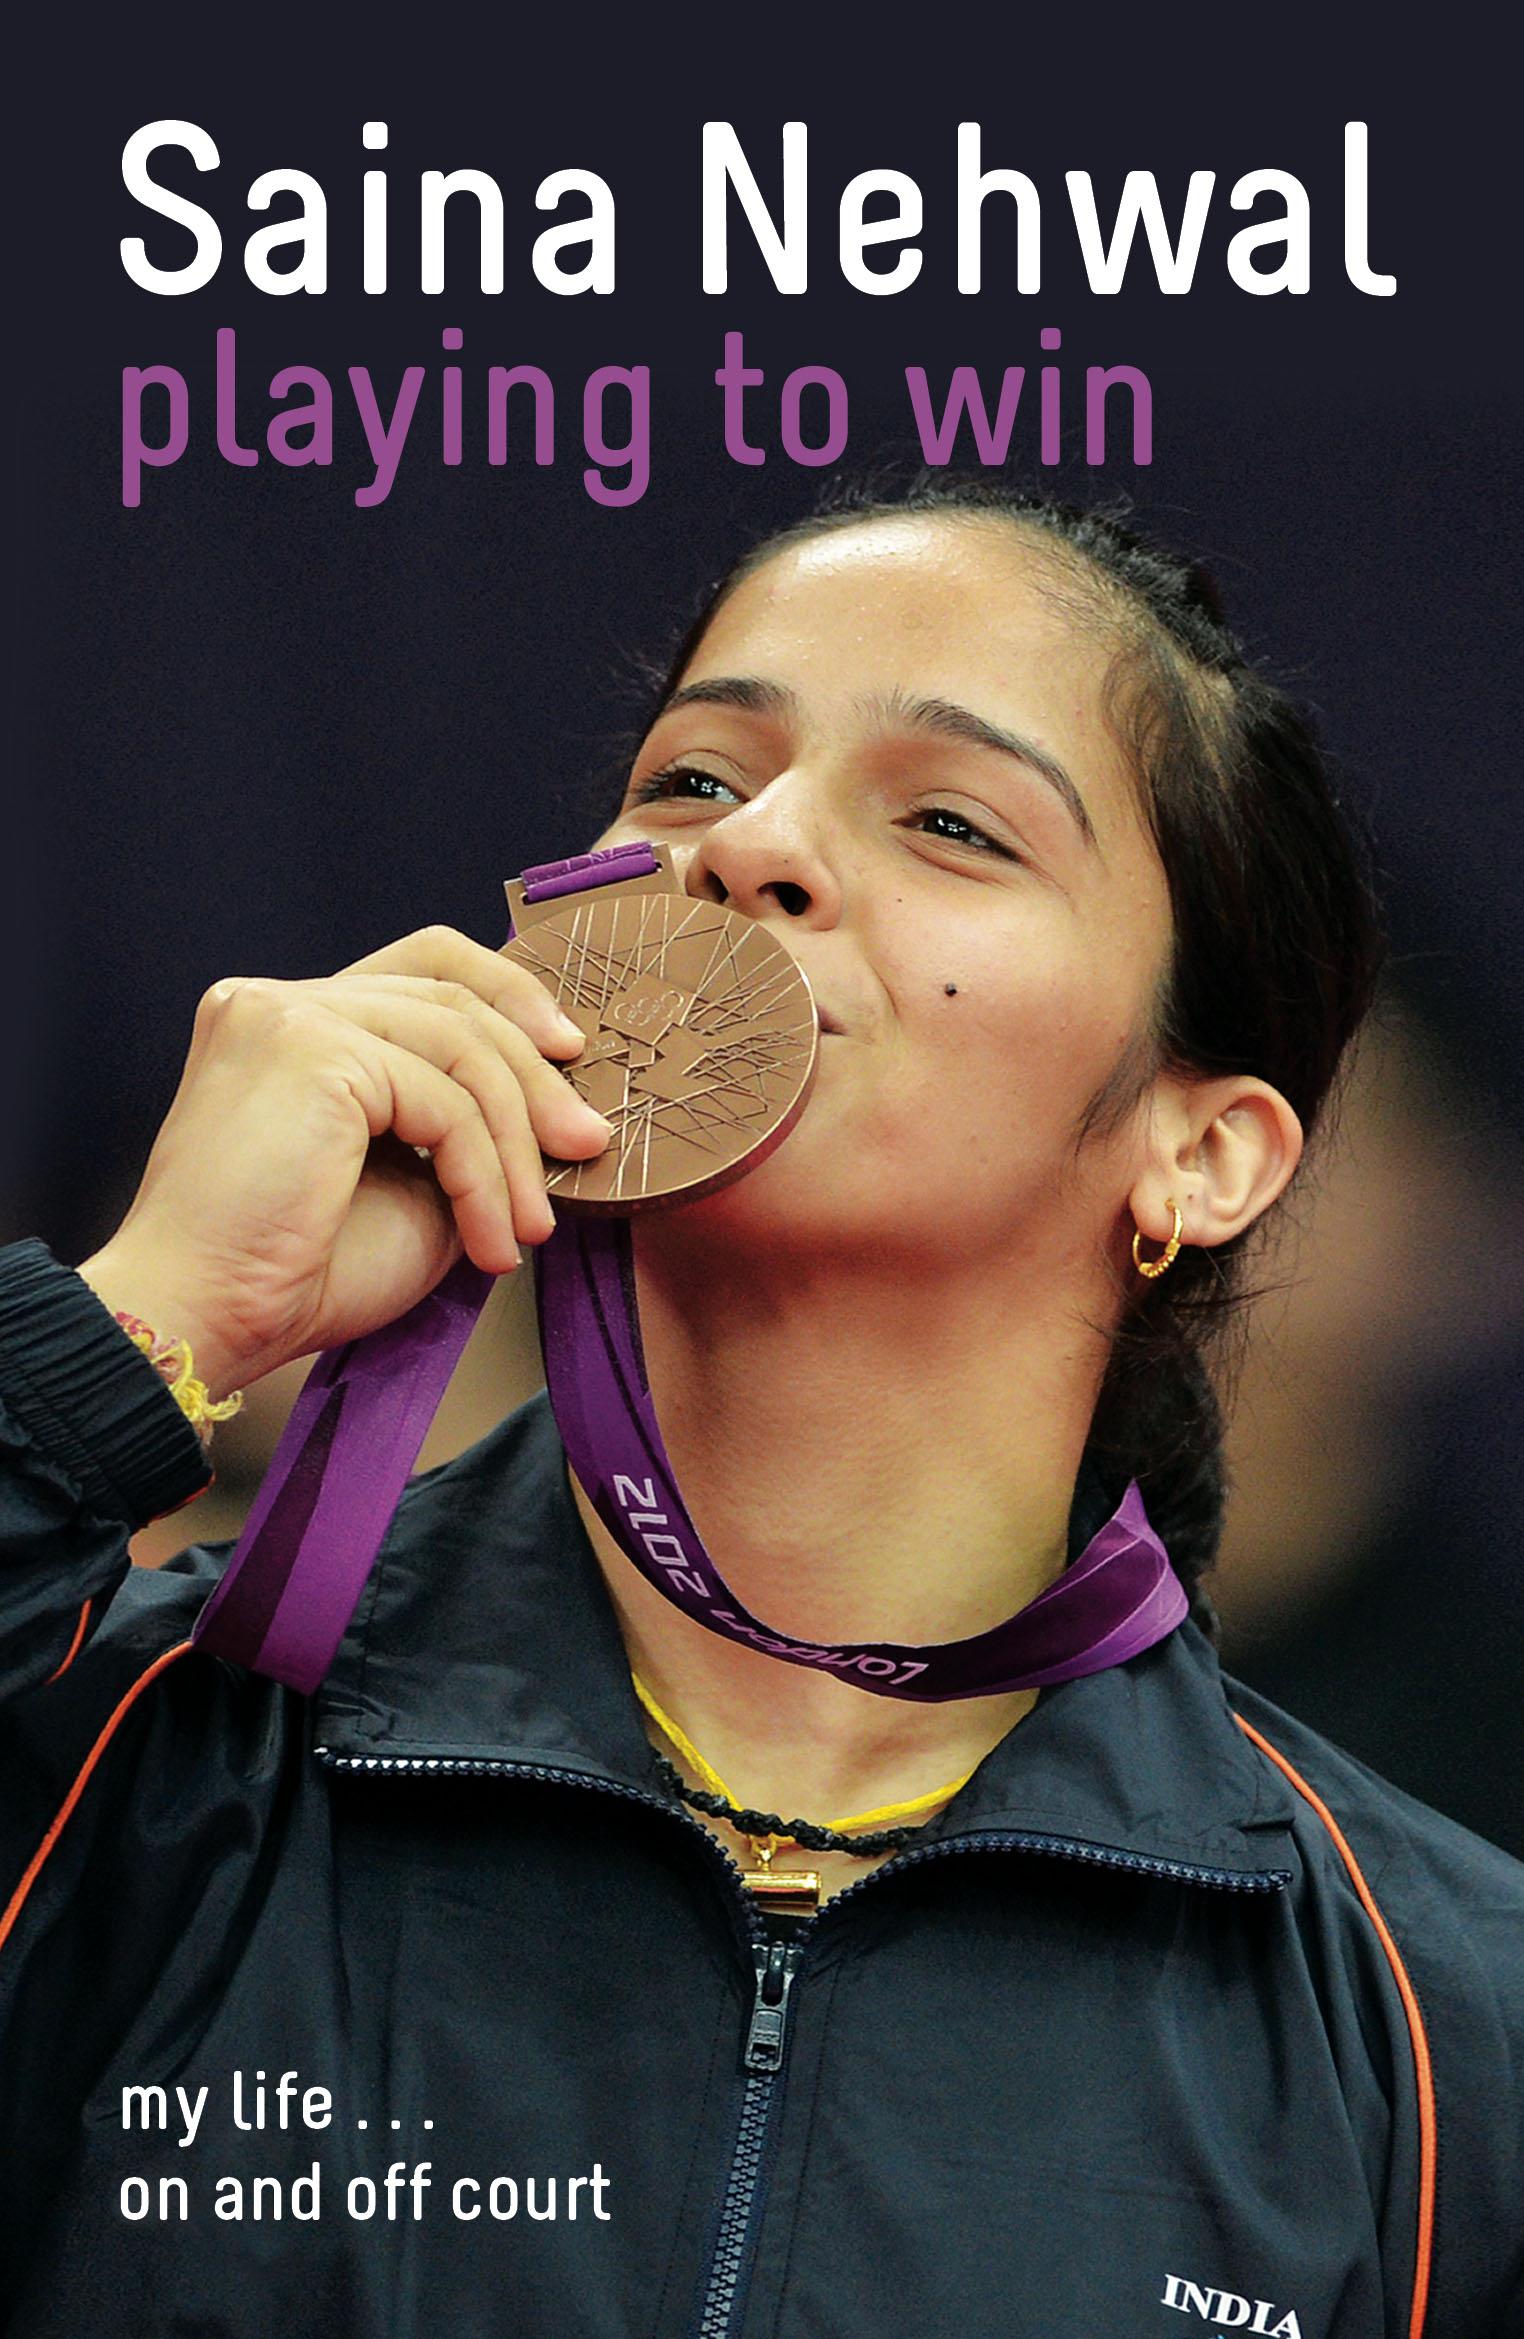 saina nehwal, saina nehwal pics, saina nehwal photos, saina nehwal wallpapers, saina nehwal latest pics, Badminton, women Badminton, Indian Badminton Player, saina nehwal hot, saina nehwal sexy, saina nehwal marriage, saina nehwal love, Hyderabad, india, saina nehwal twitter, #sainanehwal